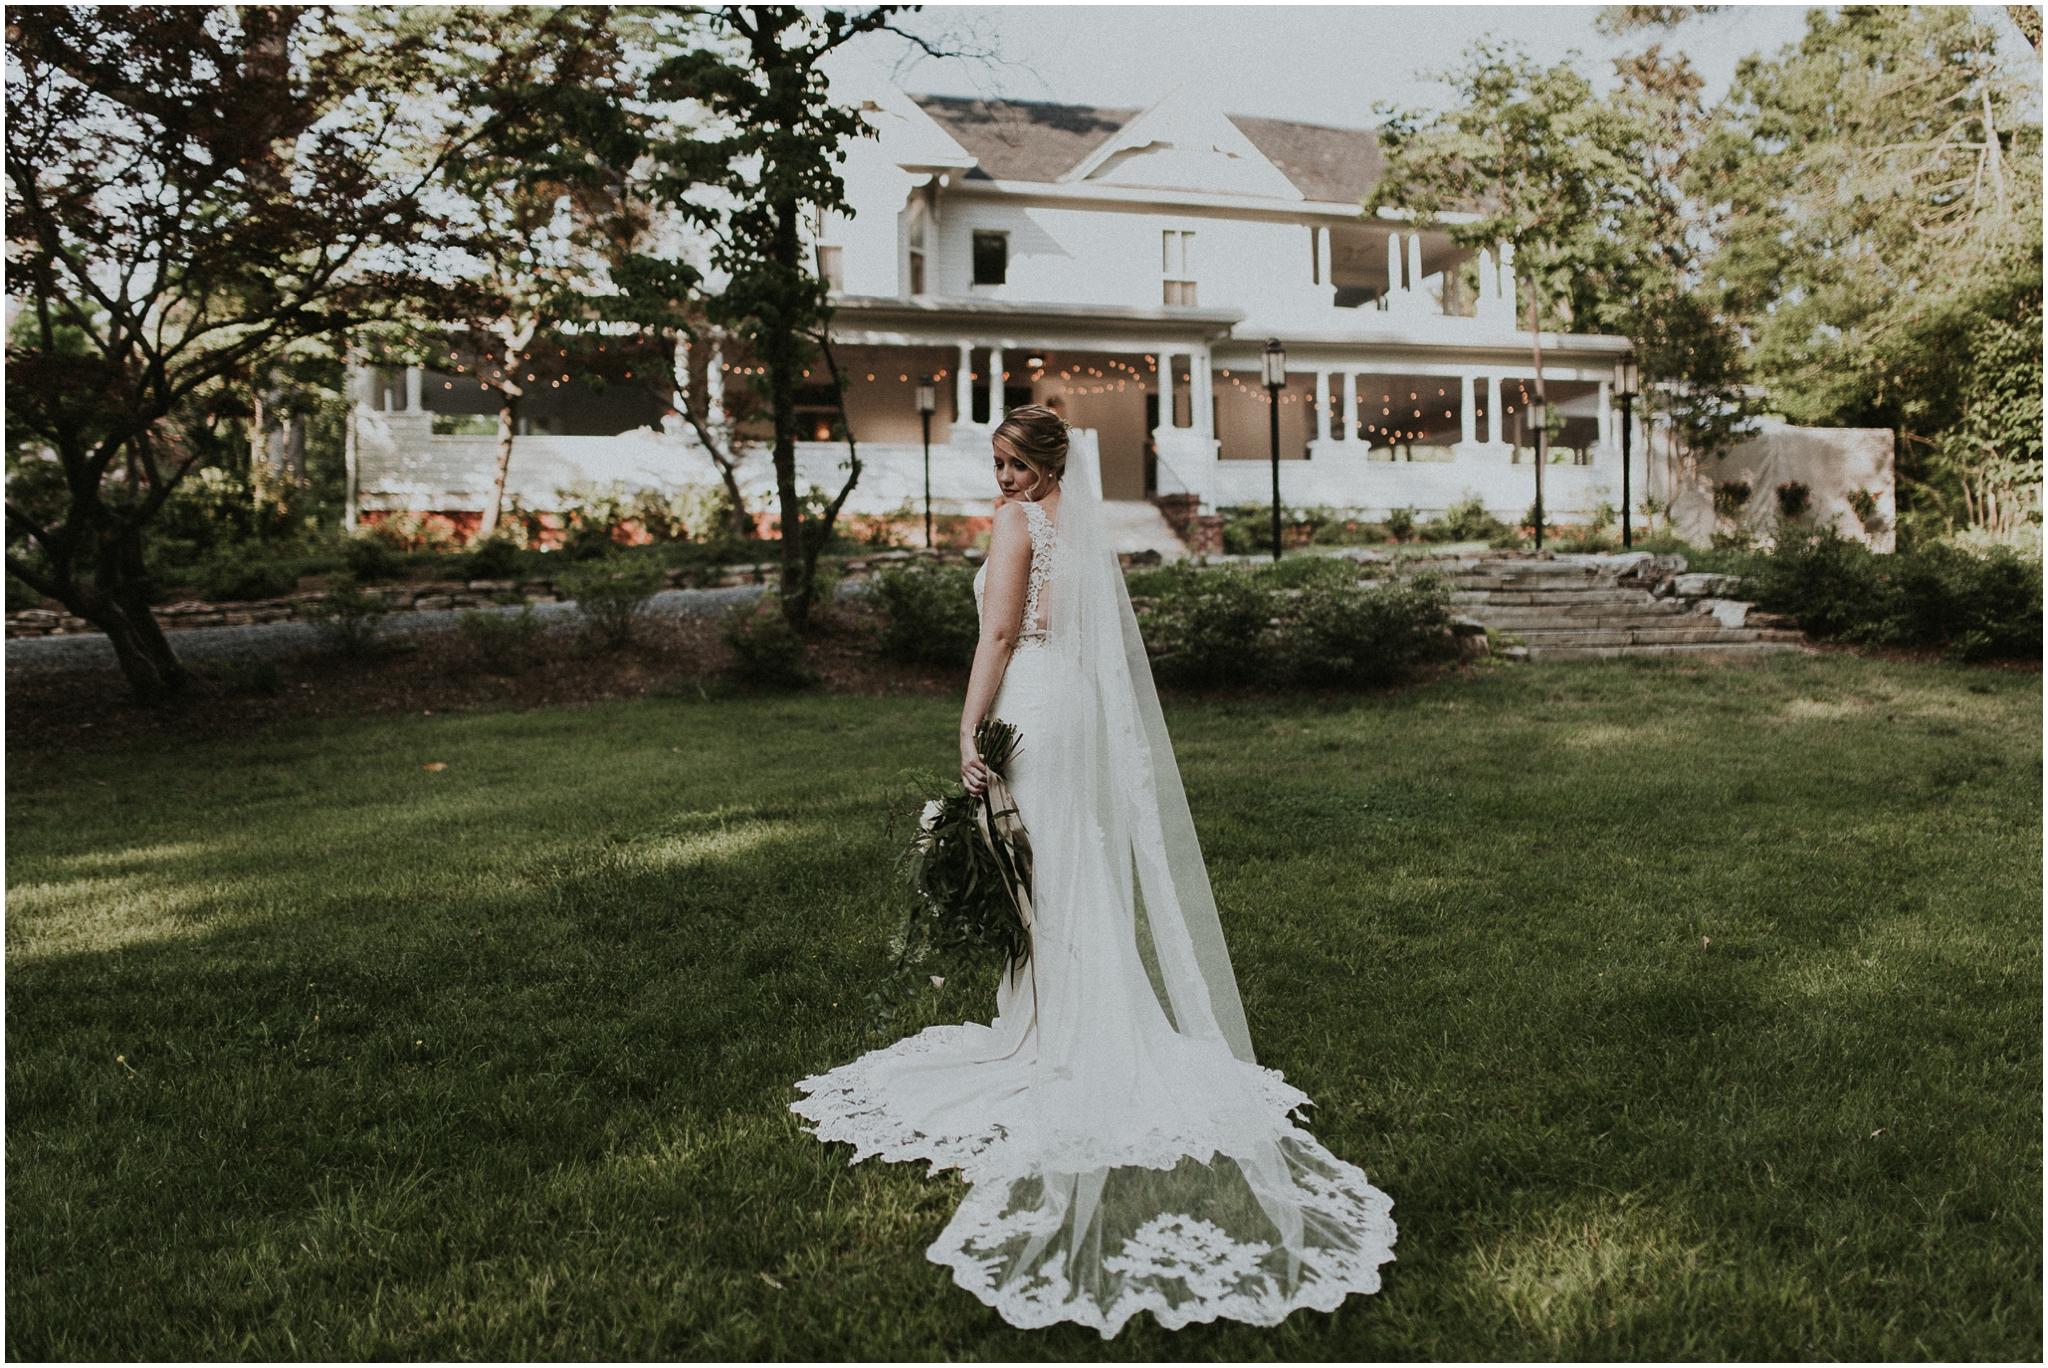 Wedding-photographer-ritchie-hill_0021.jpg